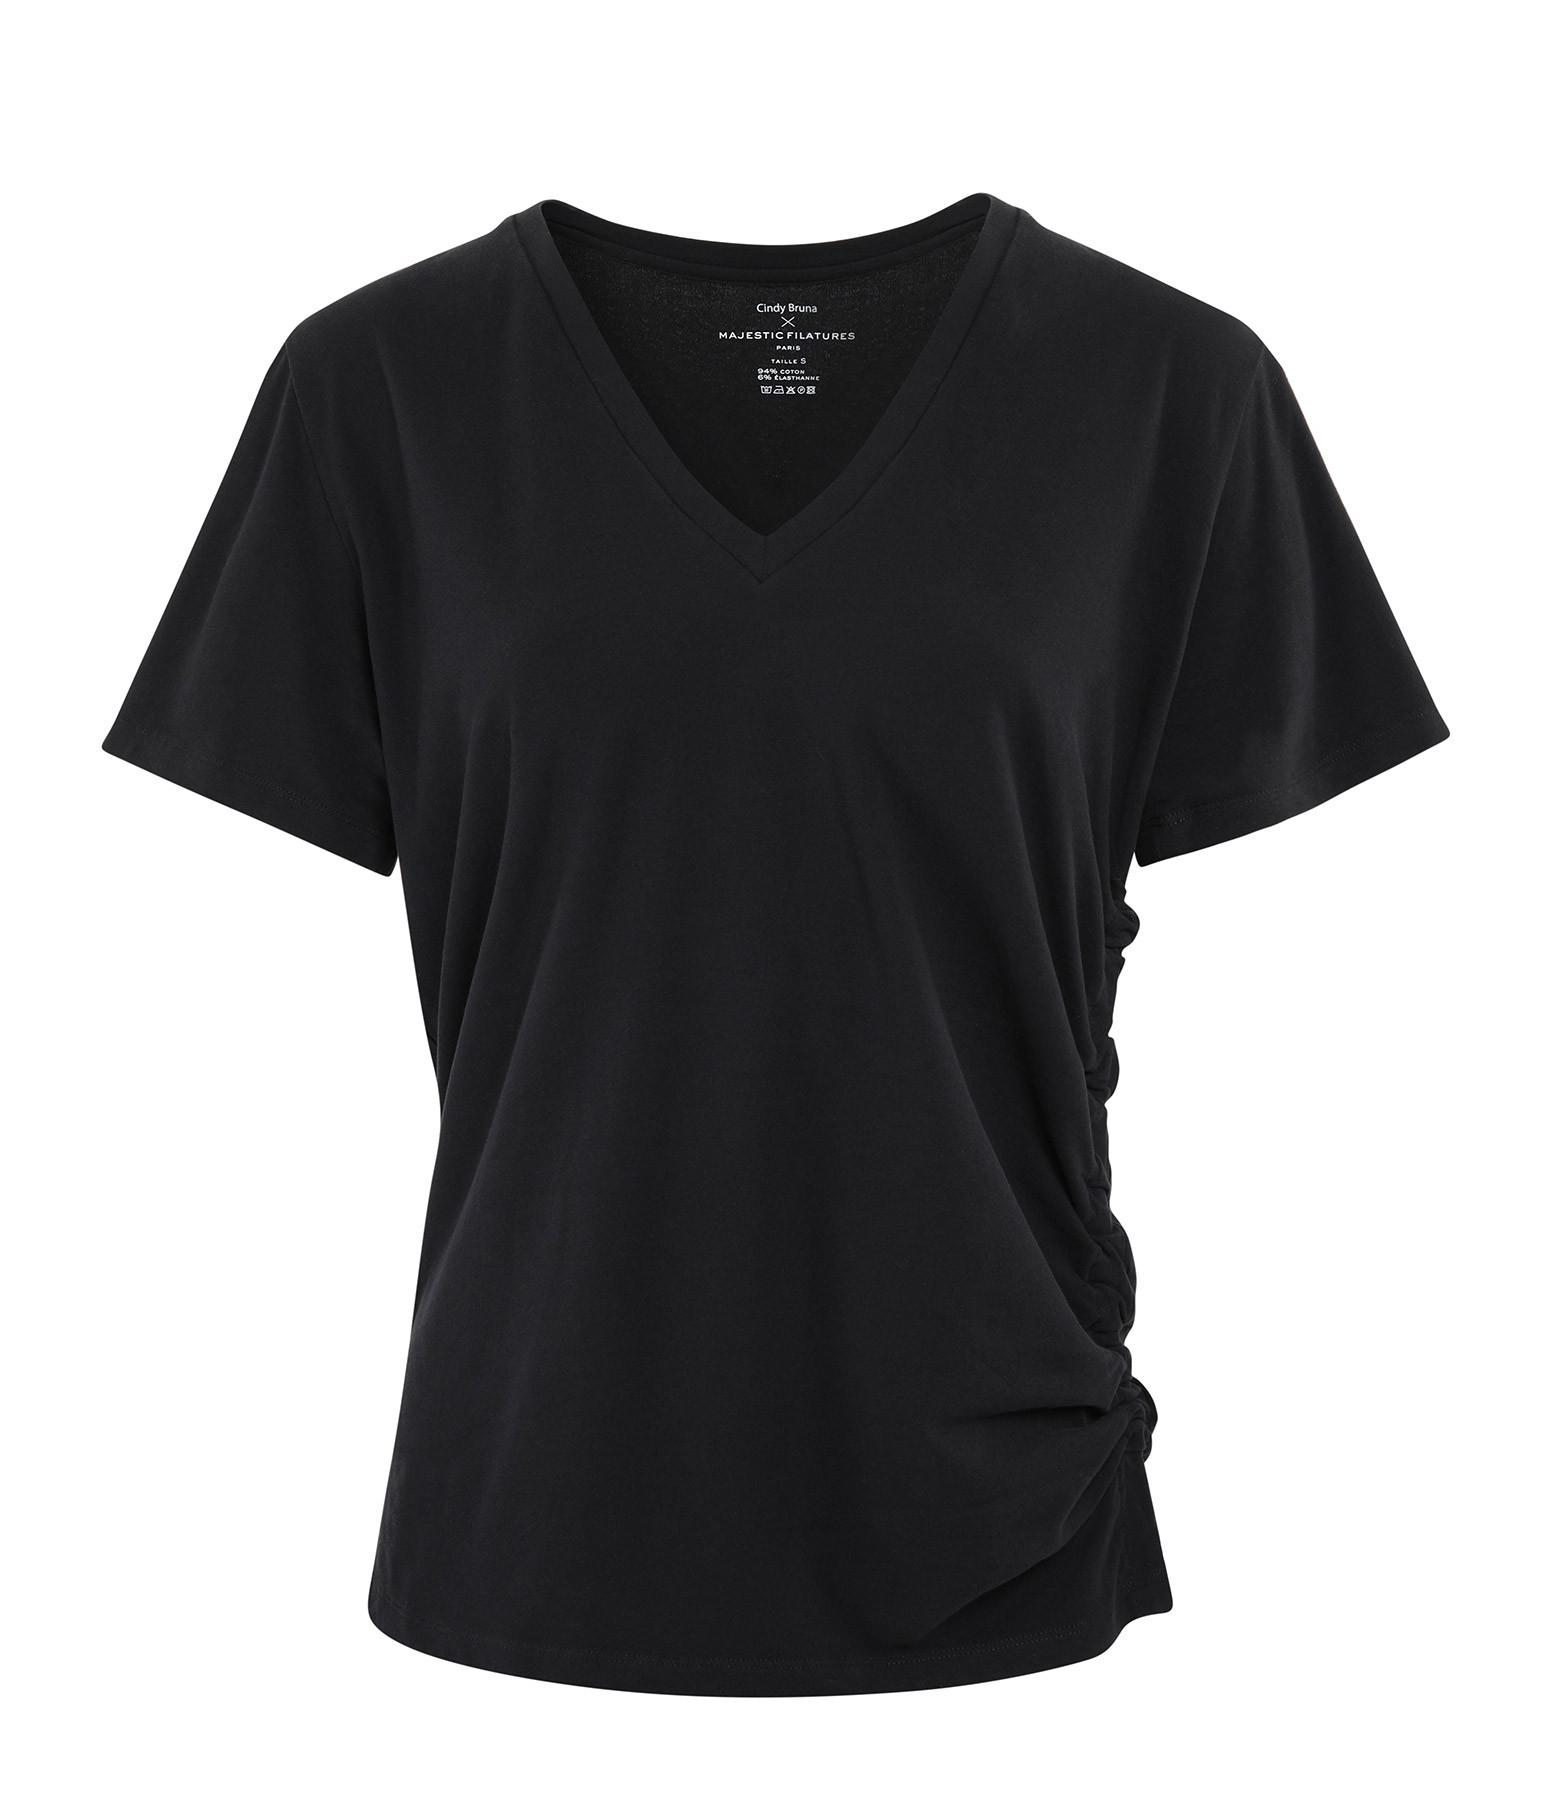 MAJESTIC FILATURES - Tee-shirt Col V Coton Noir, Cindy Bruna